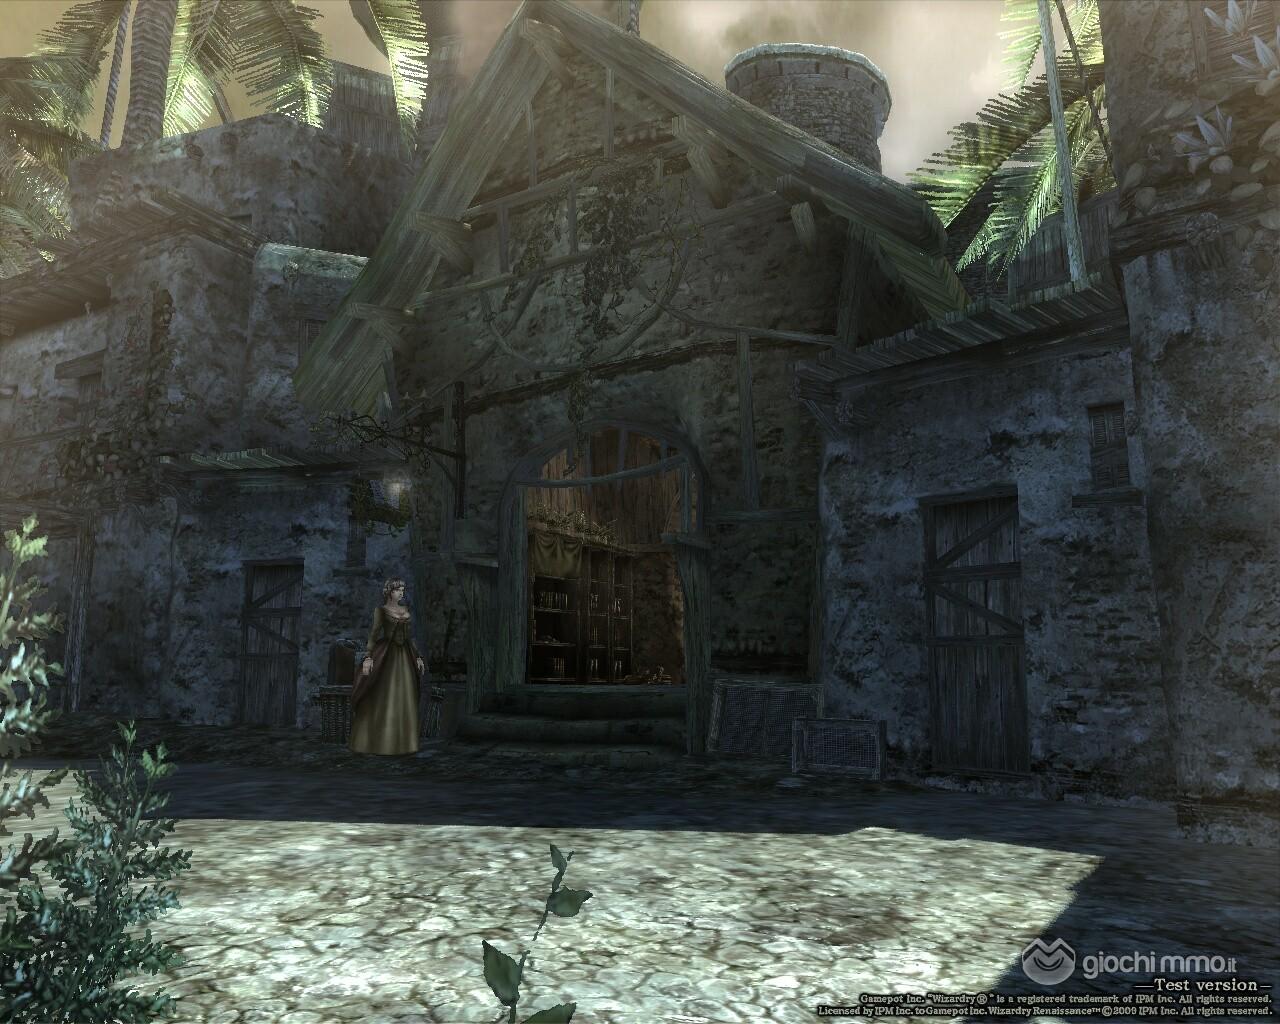 Clicca sull'immagine per ingrandirlaNome:   Wizardry Online screen4.jpgVisite: 24Dimensione:   409.5 KBID: 8296